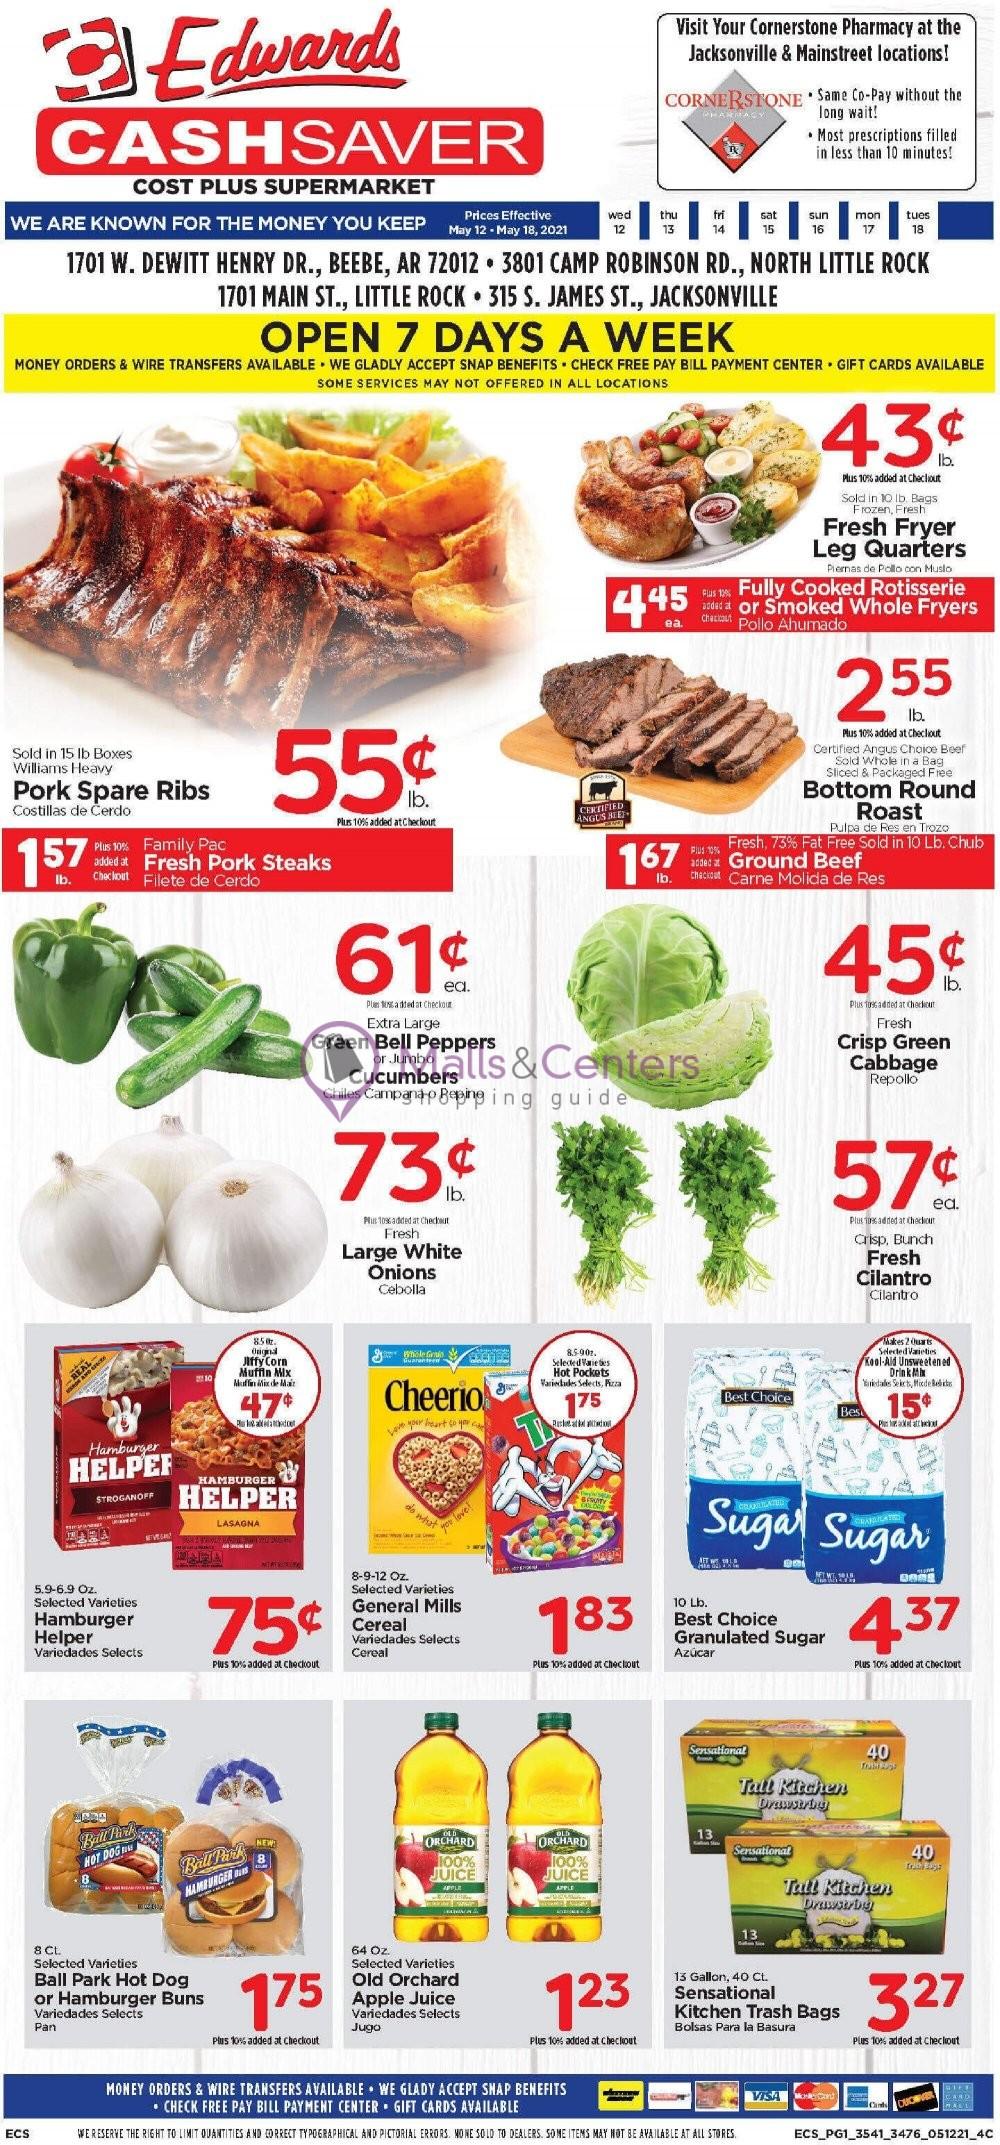 weekly ads Edwards Cash Saver - page 1 - mallscenters.com